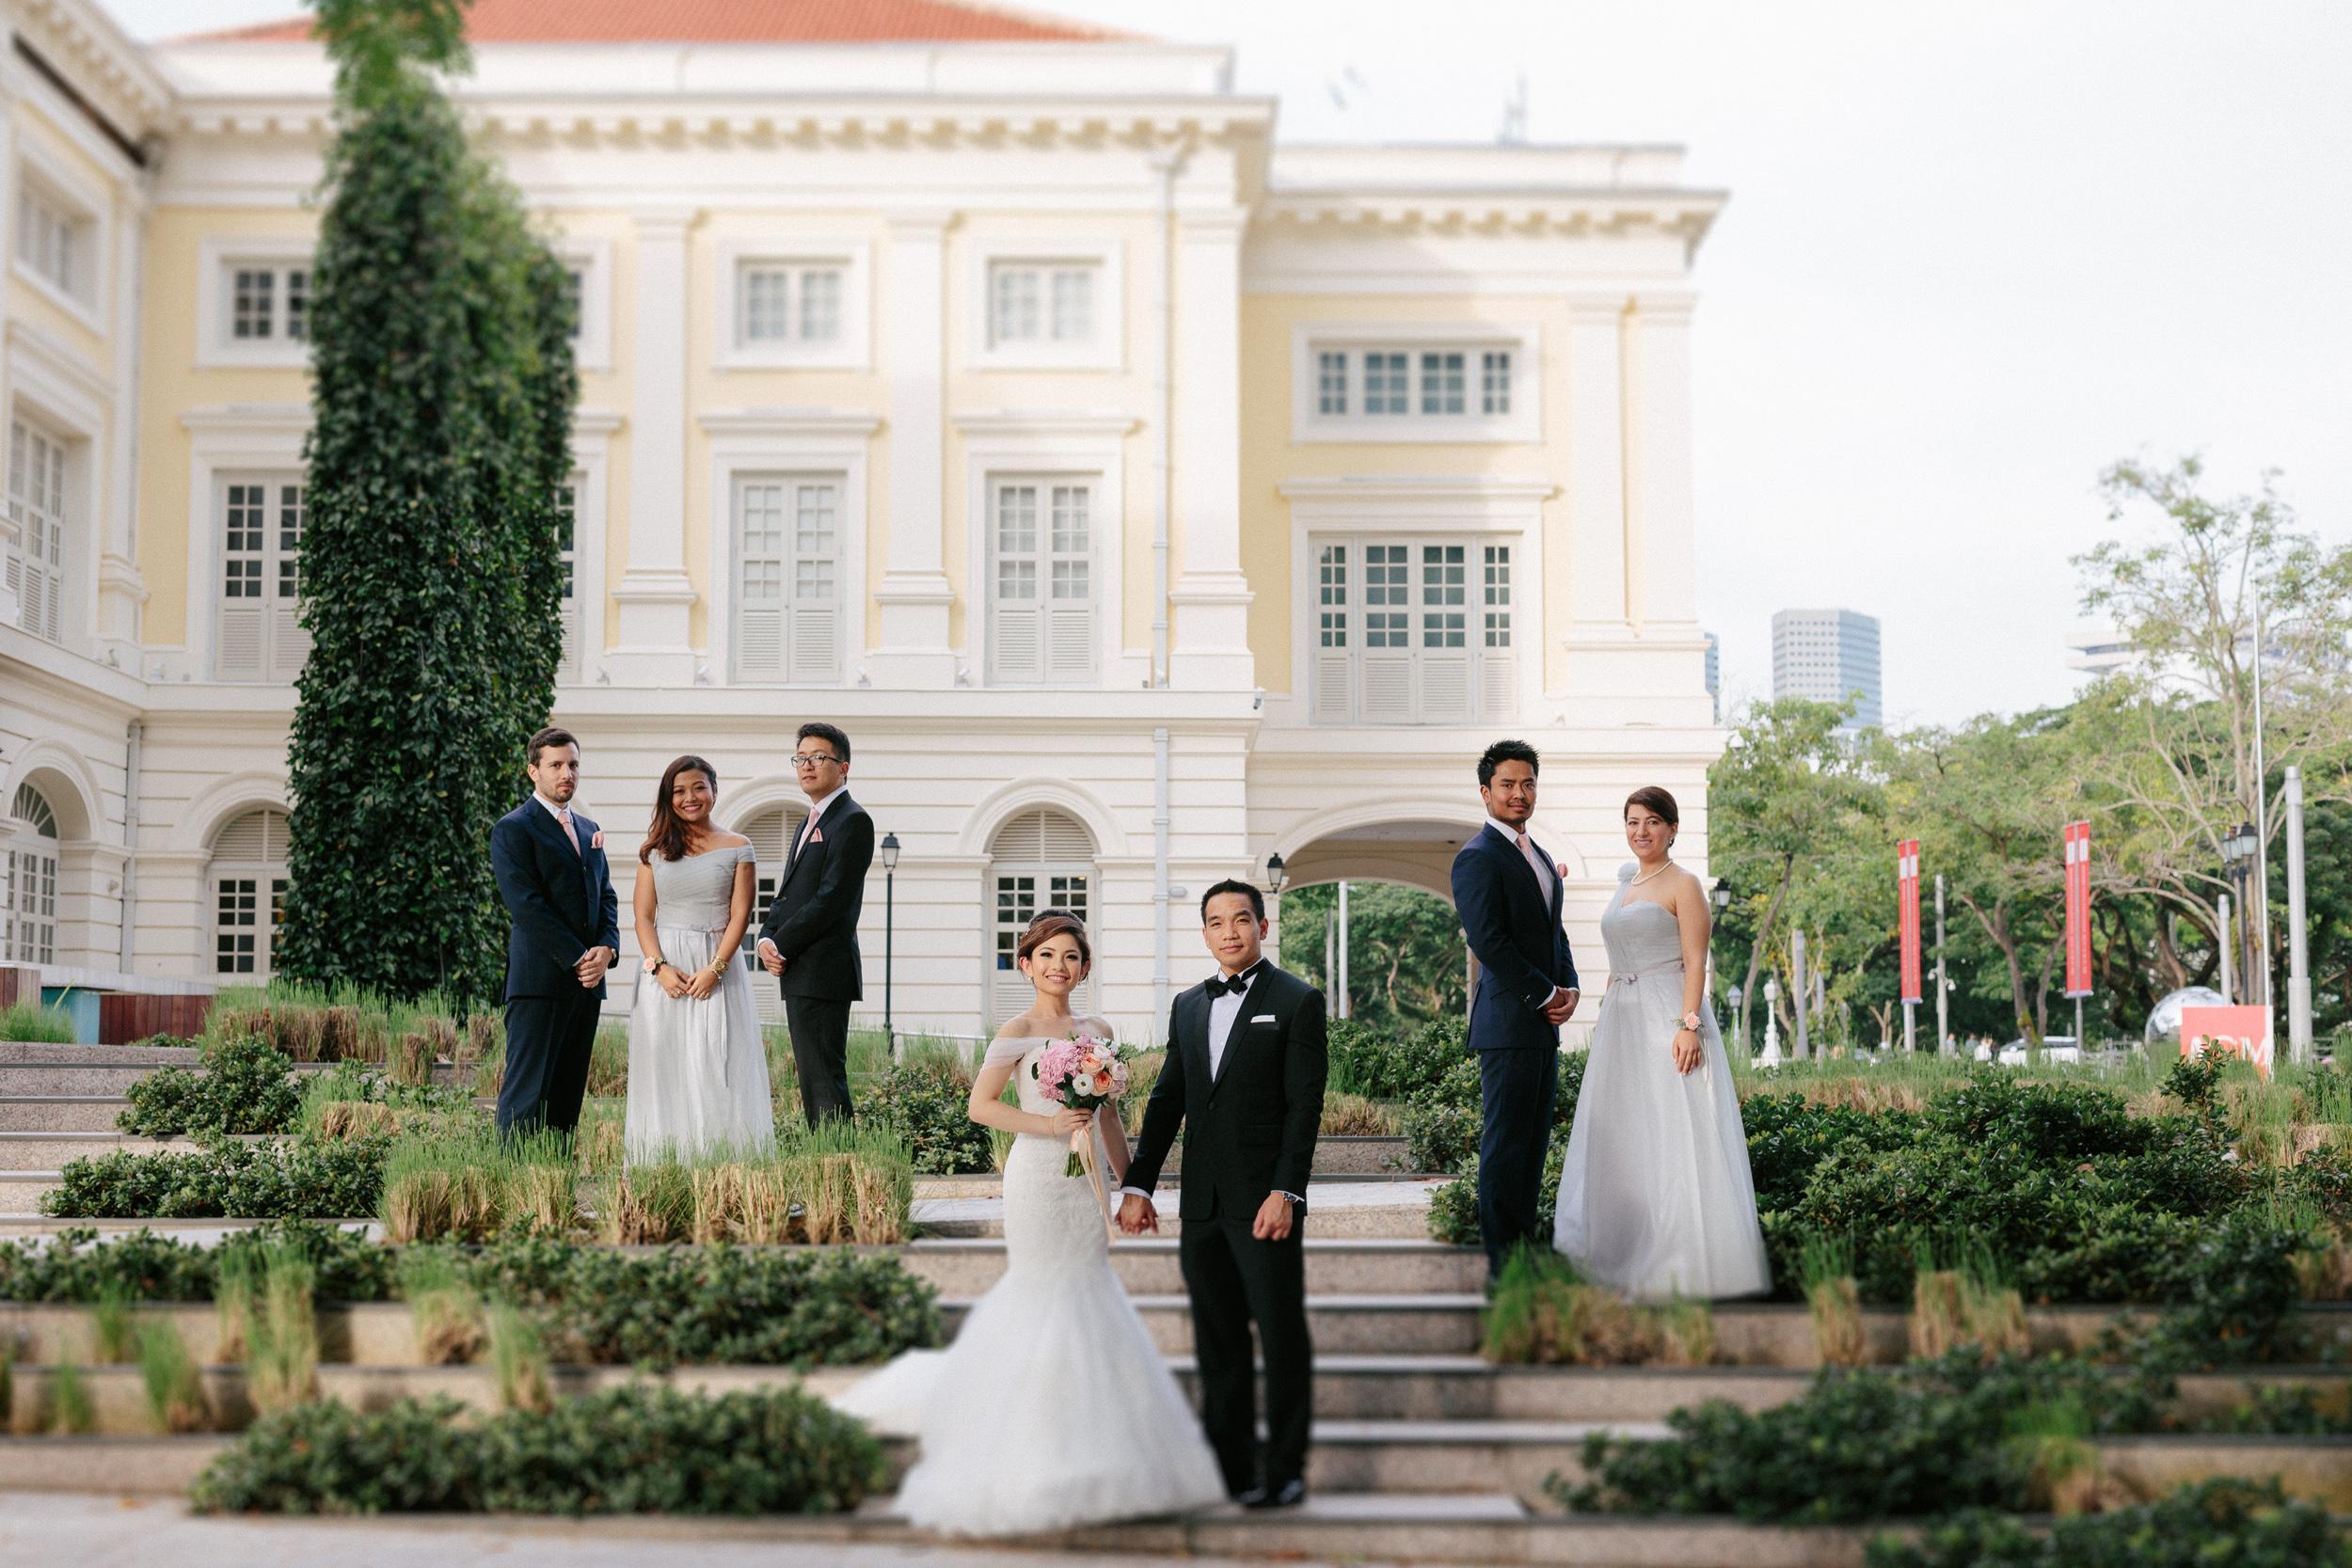 singapore-wedding-photographer-cheryl-matthew-fullerton-hotel-wedding-44.jpg